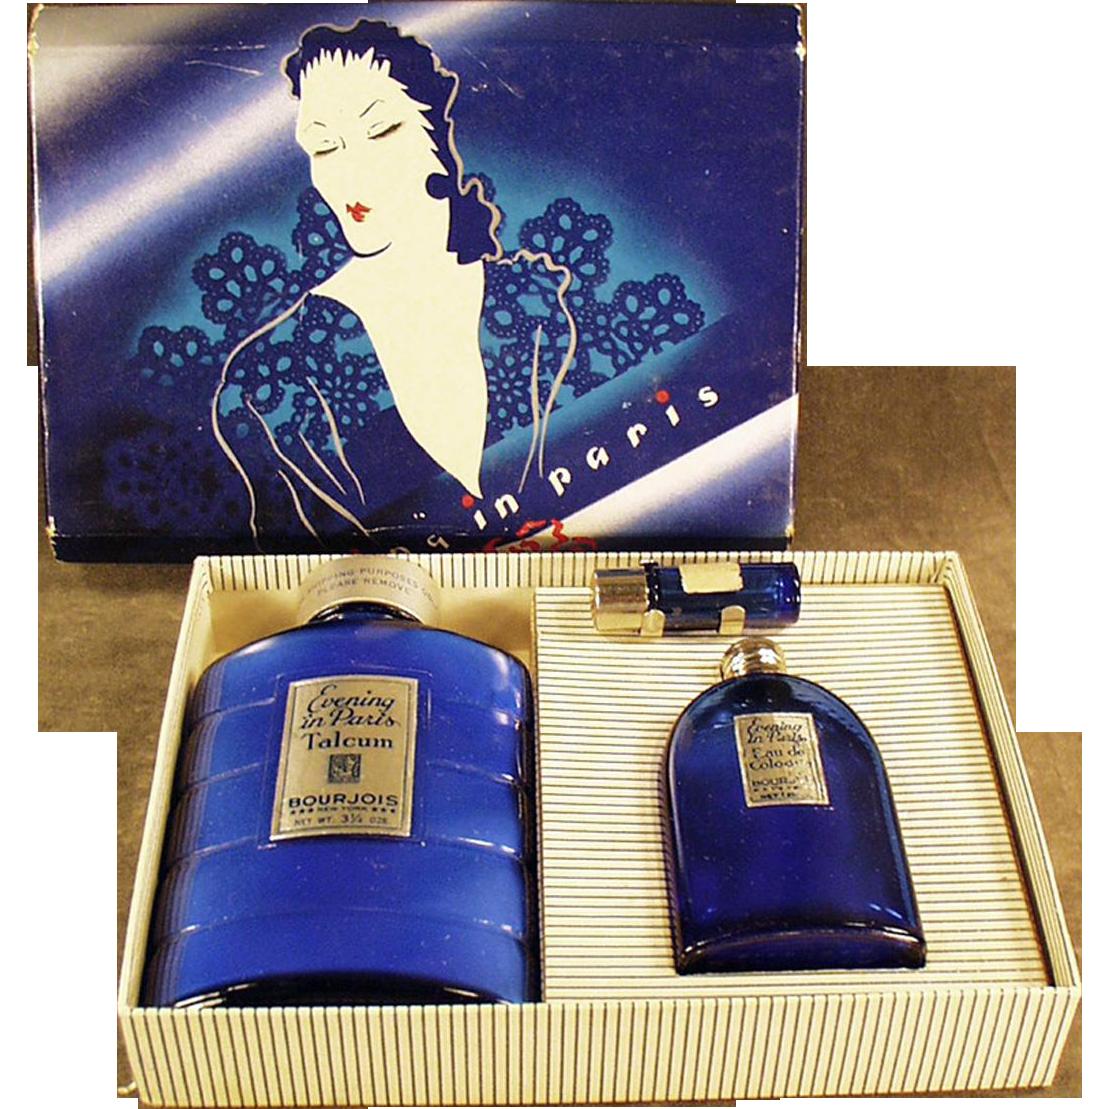 Vintage, Evening in Paris Boxed Set - Talc & Perfume Bottles